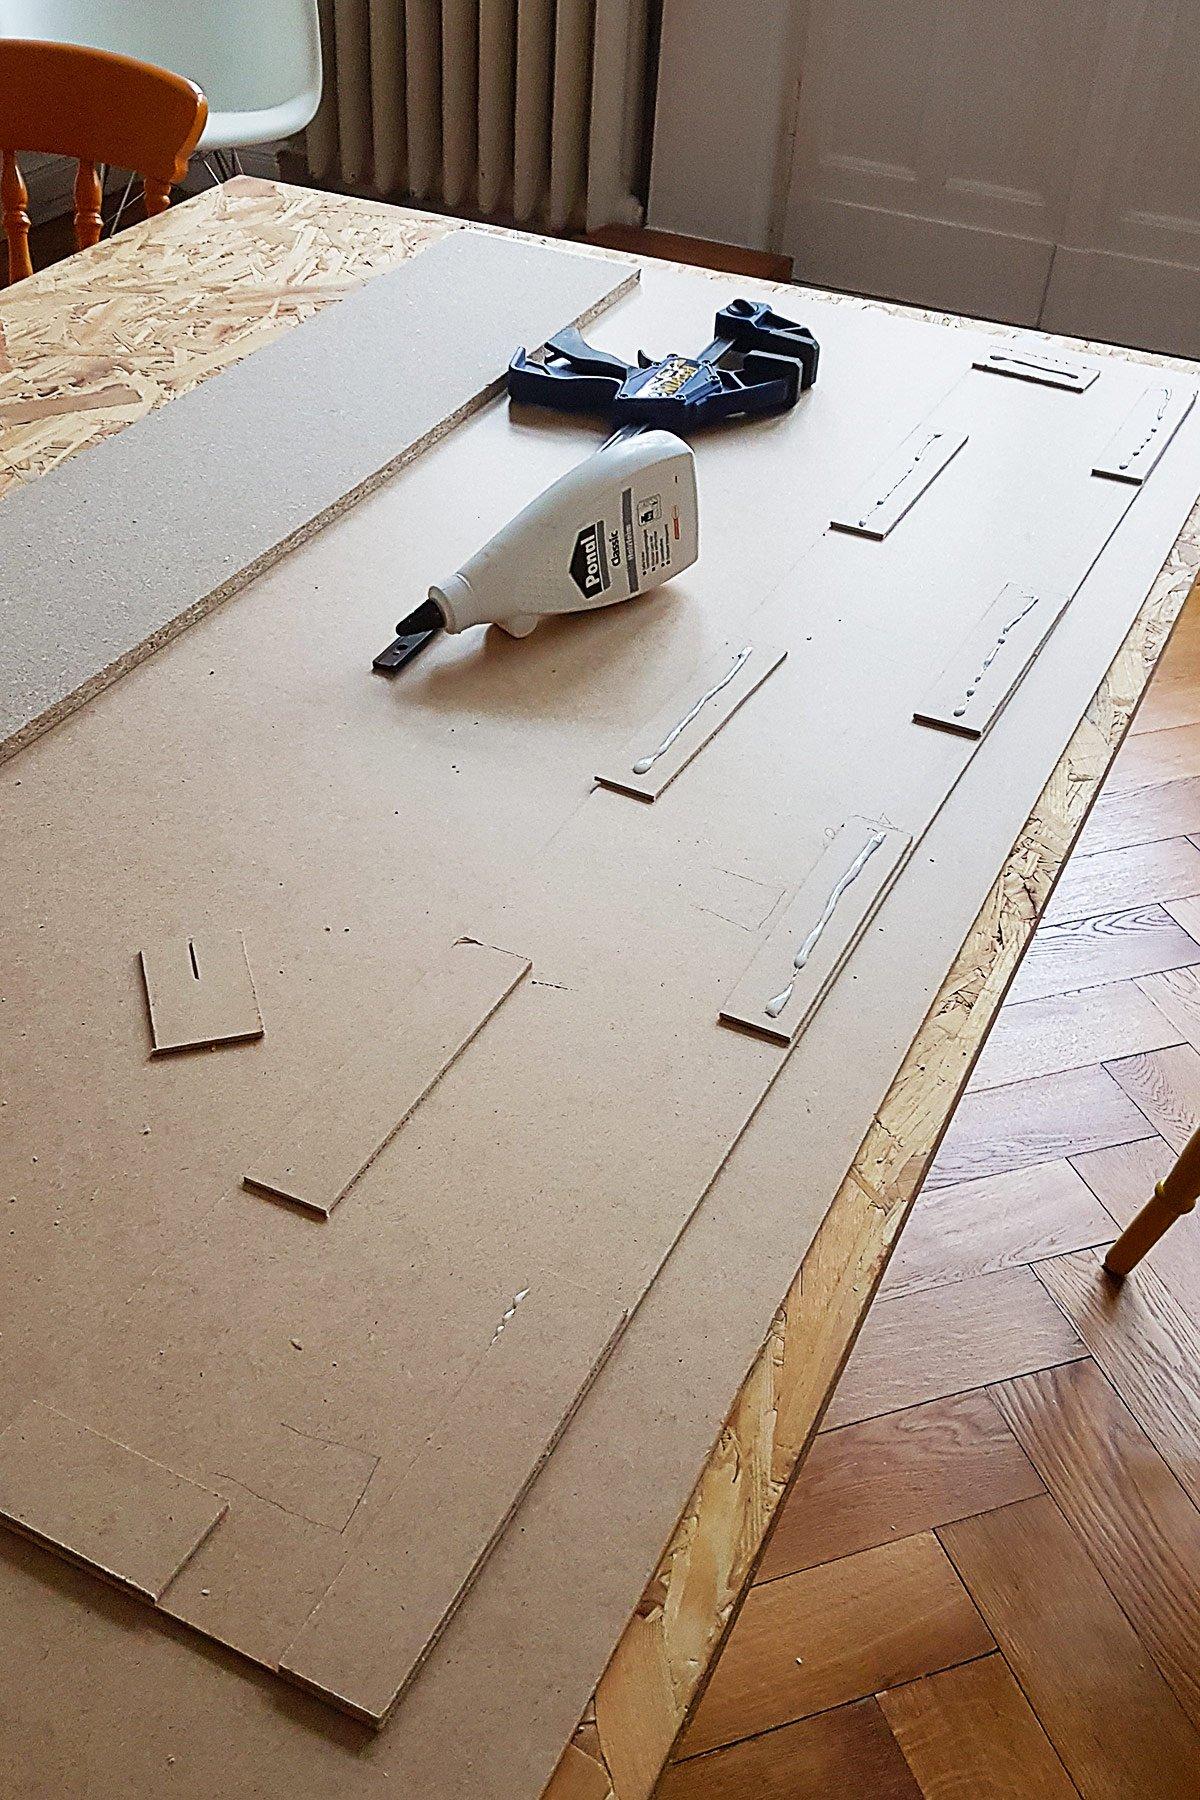 how build install super thin floating shelves little house shelf brackets diy the corner interior kitchen cabinet decorative shelving hardware white timber ceiling fan capacitor